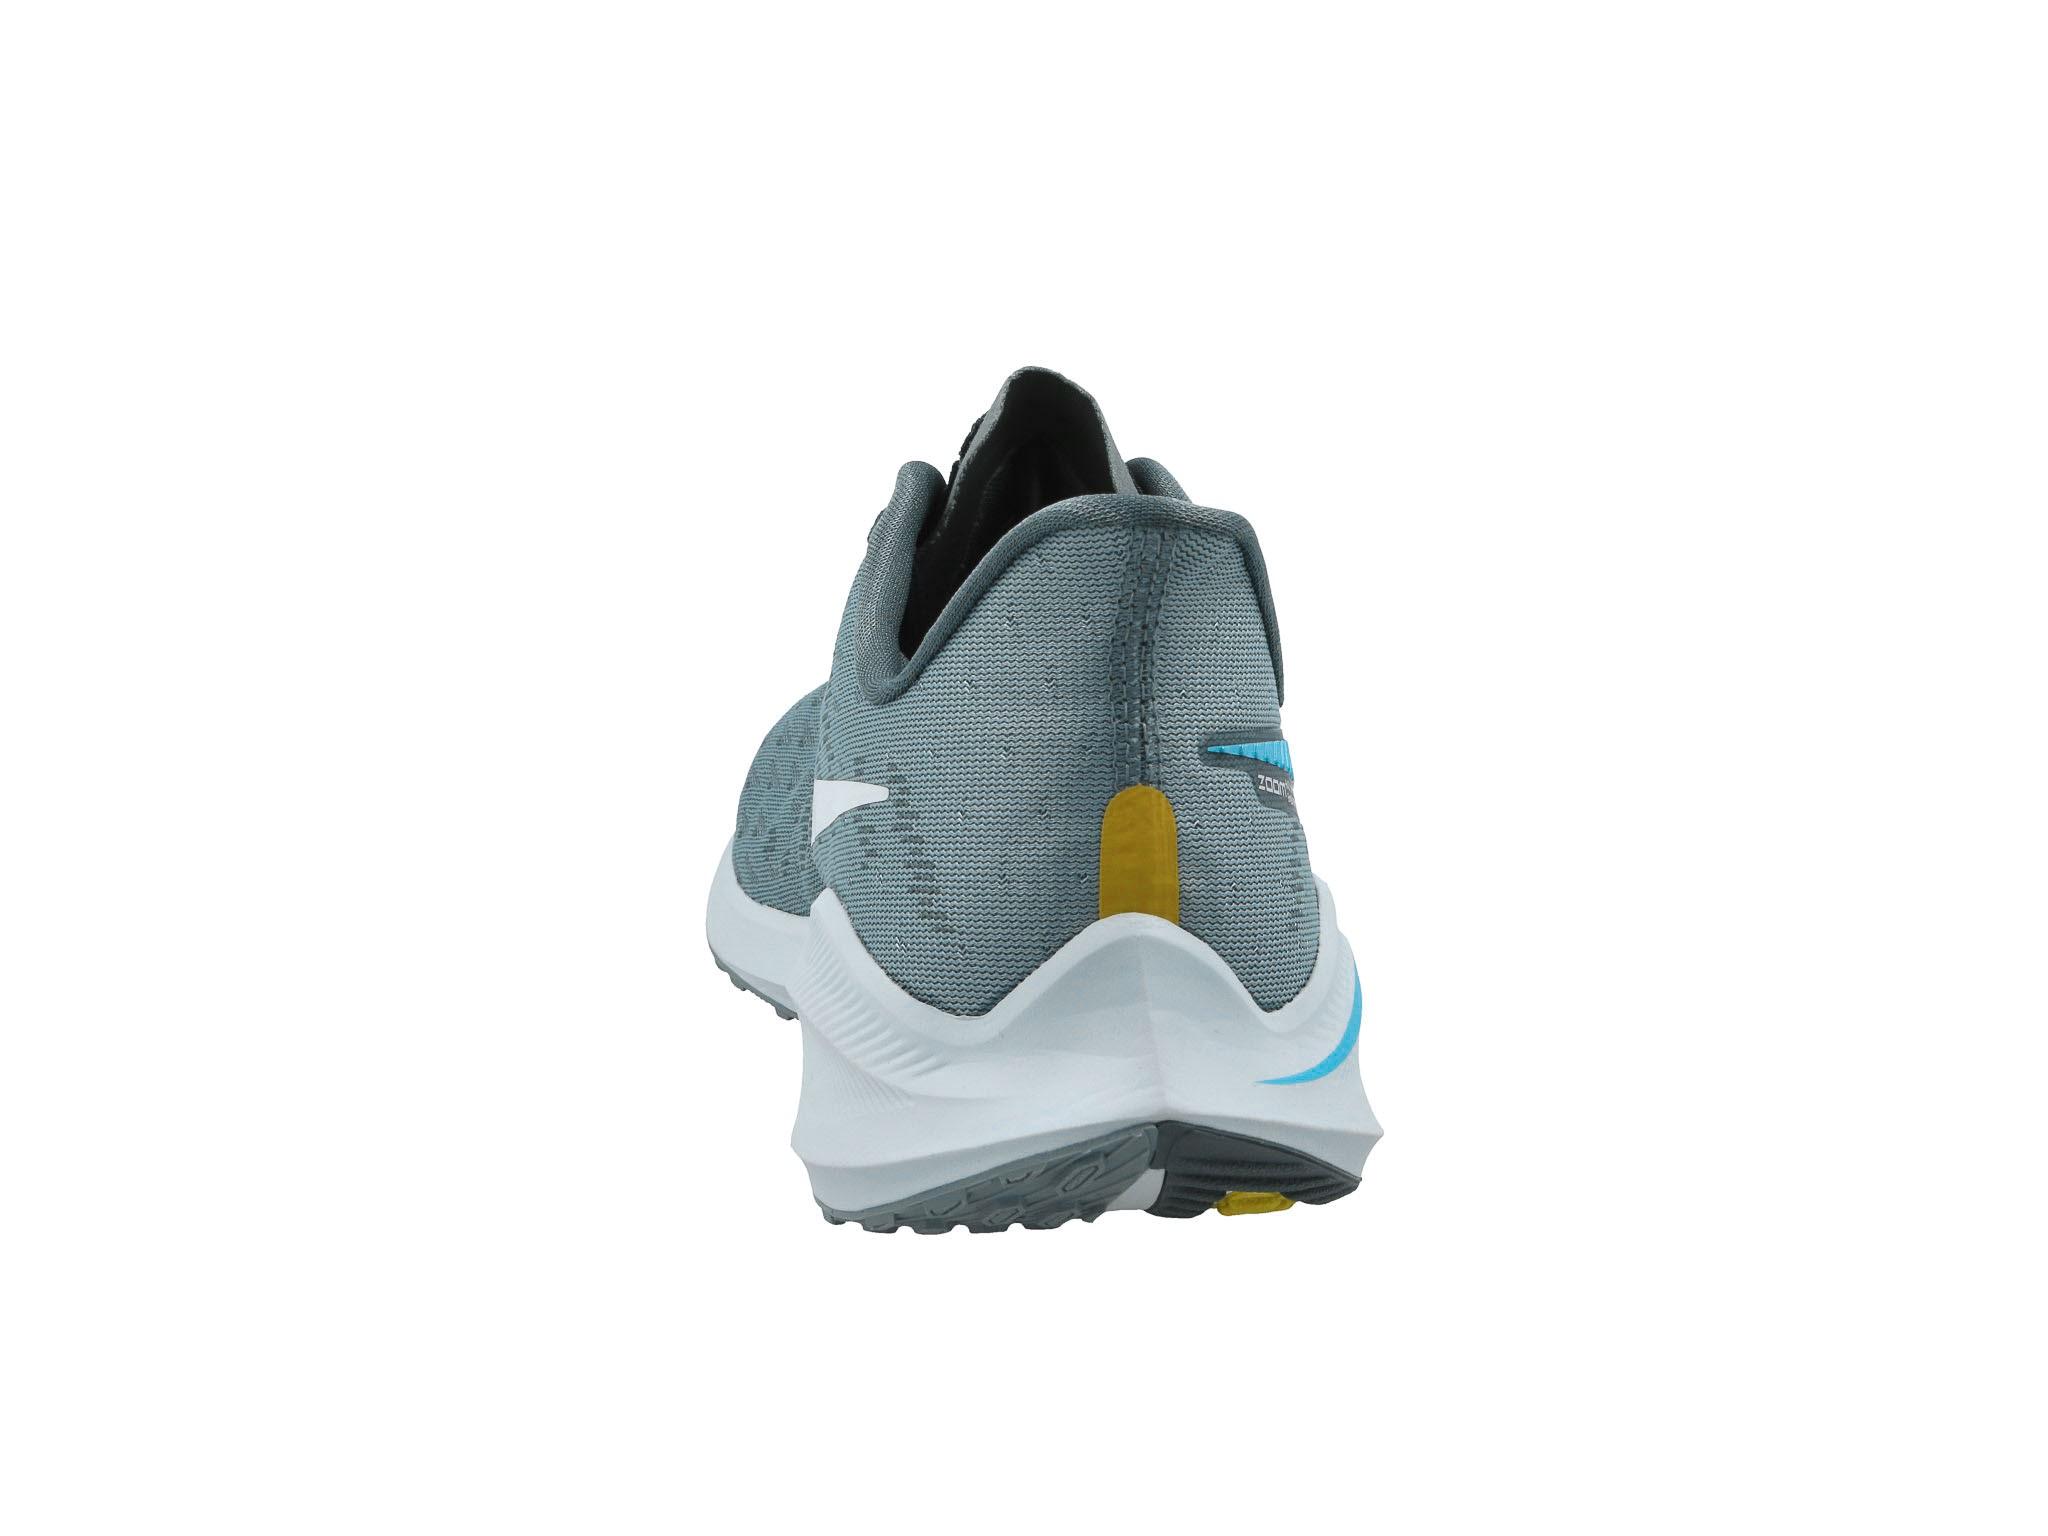 Cipő NIKE Air Zoom Vomero 14 AH7857 002 Aviator GreyPure